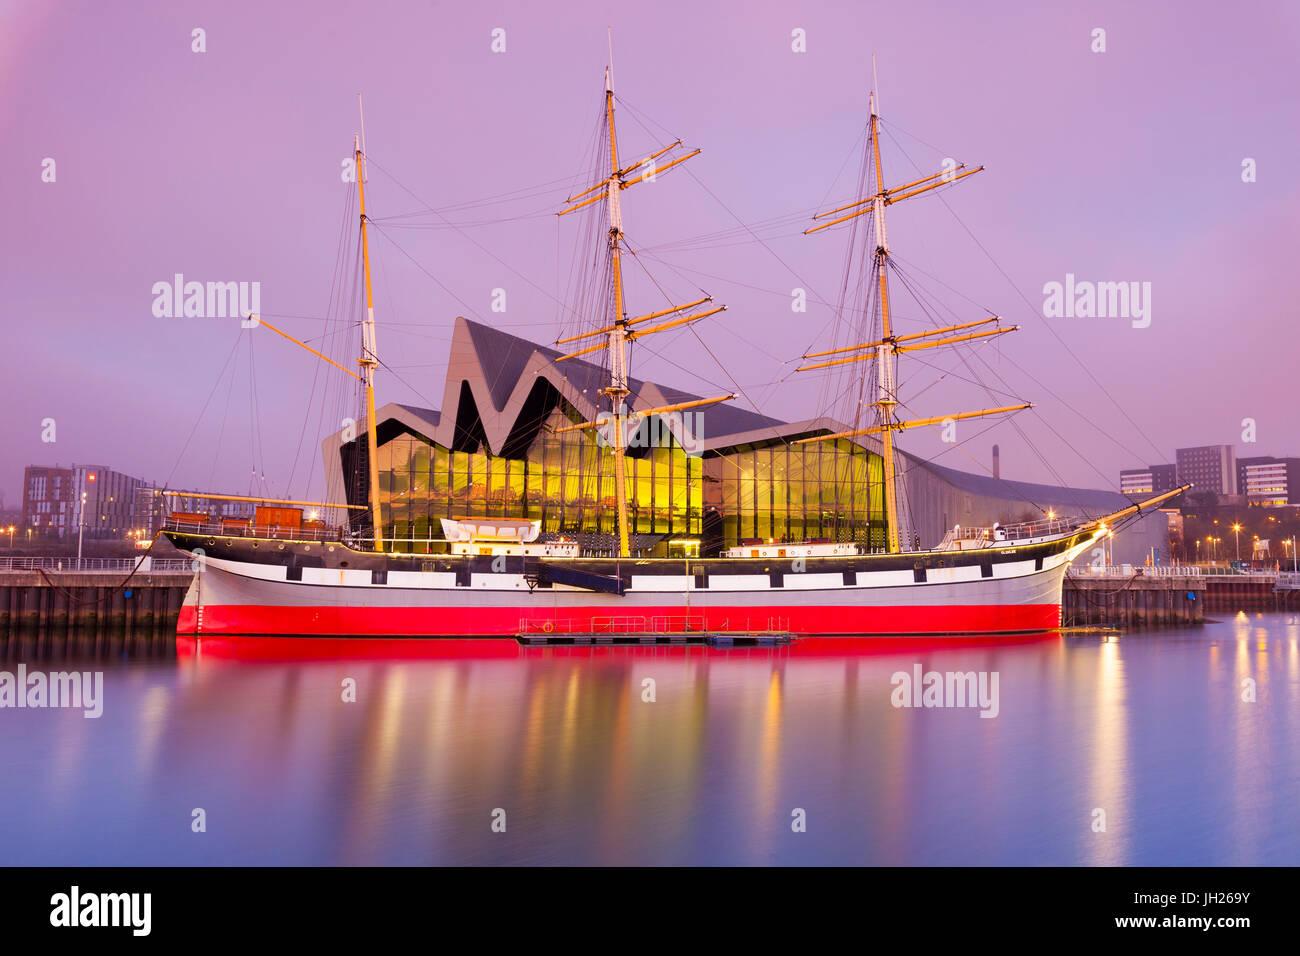 The Glenlee Ship and Riverside Museum, Glasgow, Scotland, United Kingdom, Europe - Stock Image